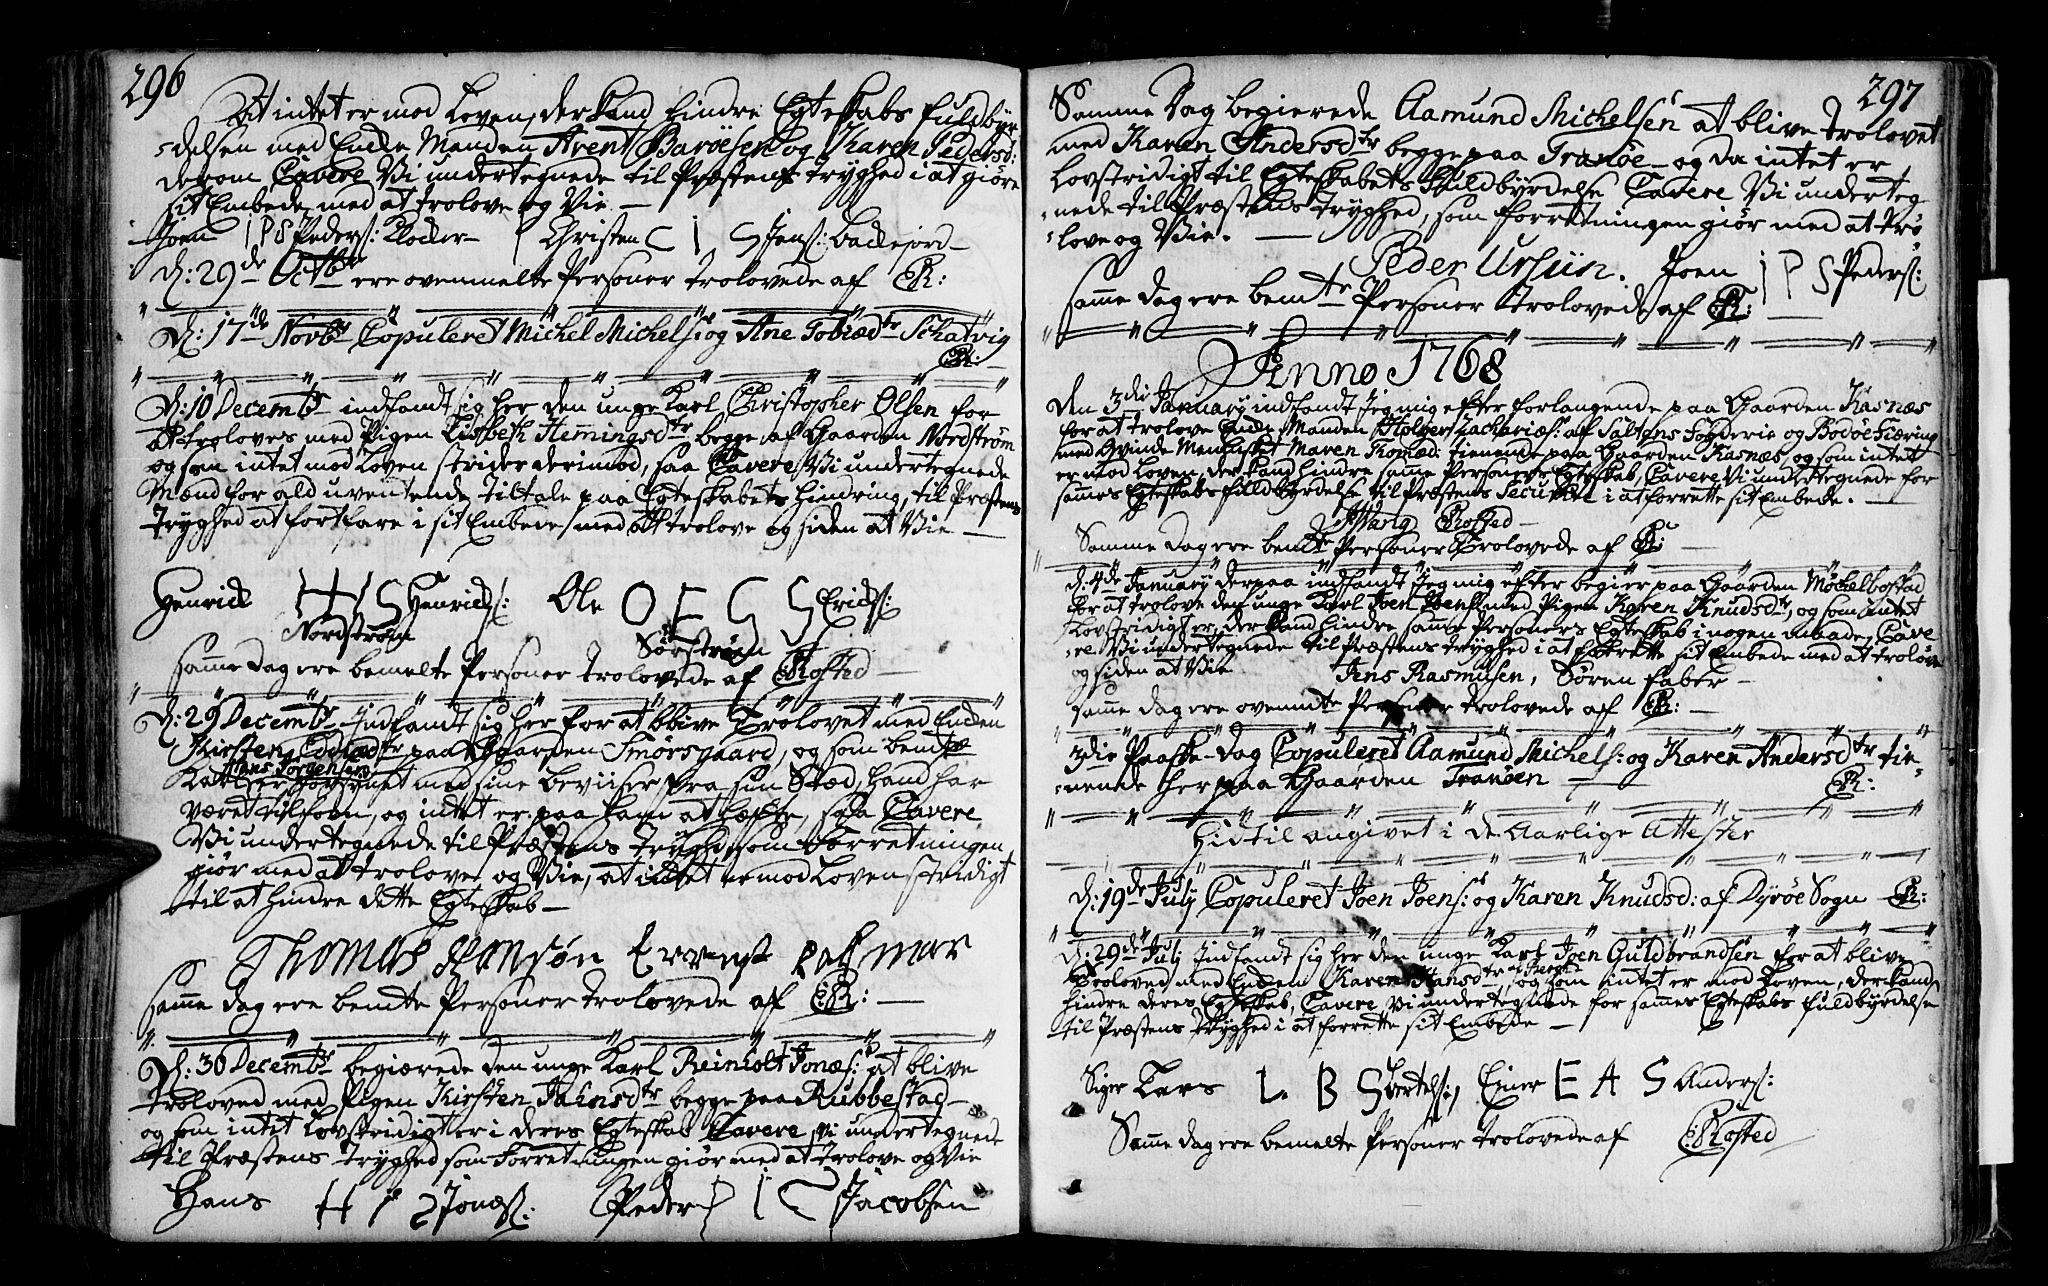 SATØ, Tranøy sokneprestkontor, I/Ia/Iaa/L0001kirke: Ministerialbok nr. 1, 1757-1773, s. 296-297